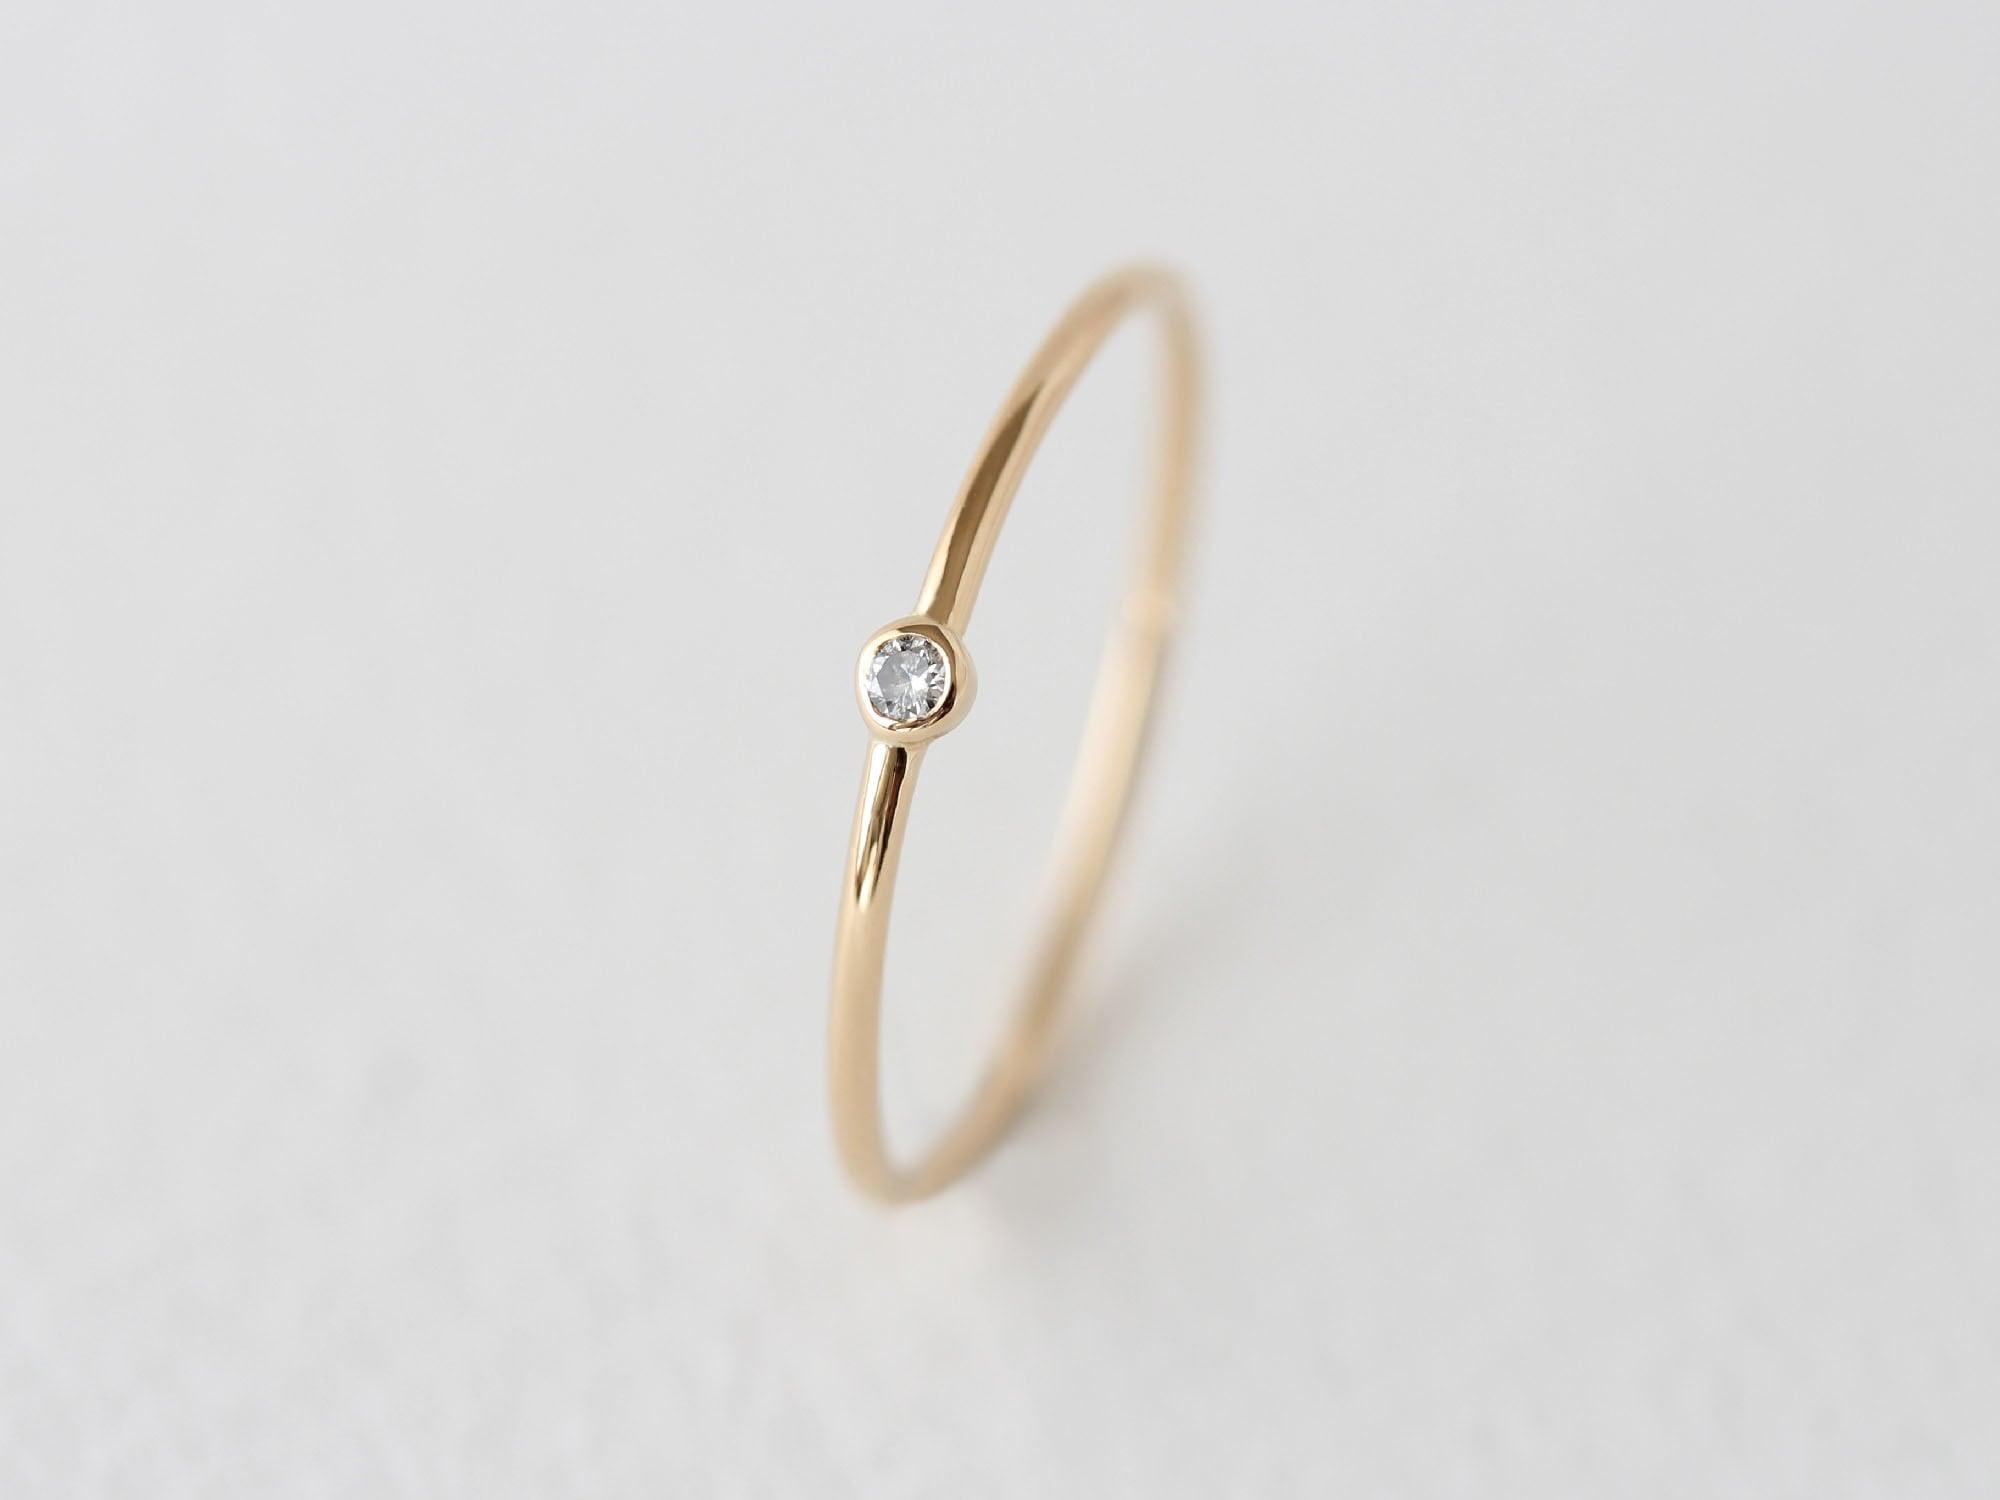 K18YG Diamond/1.8round grain ring